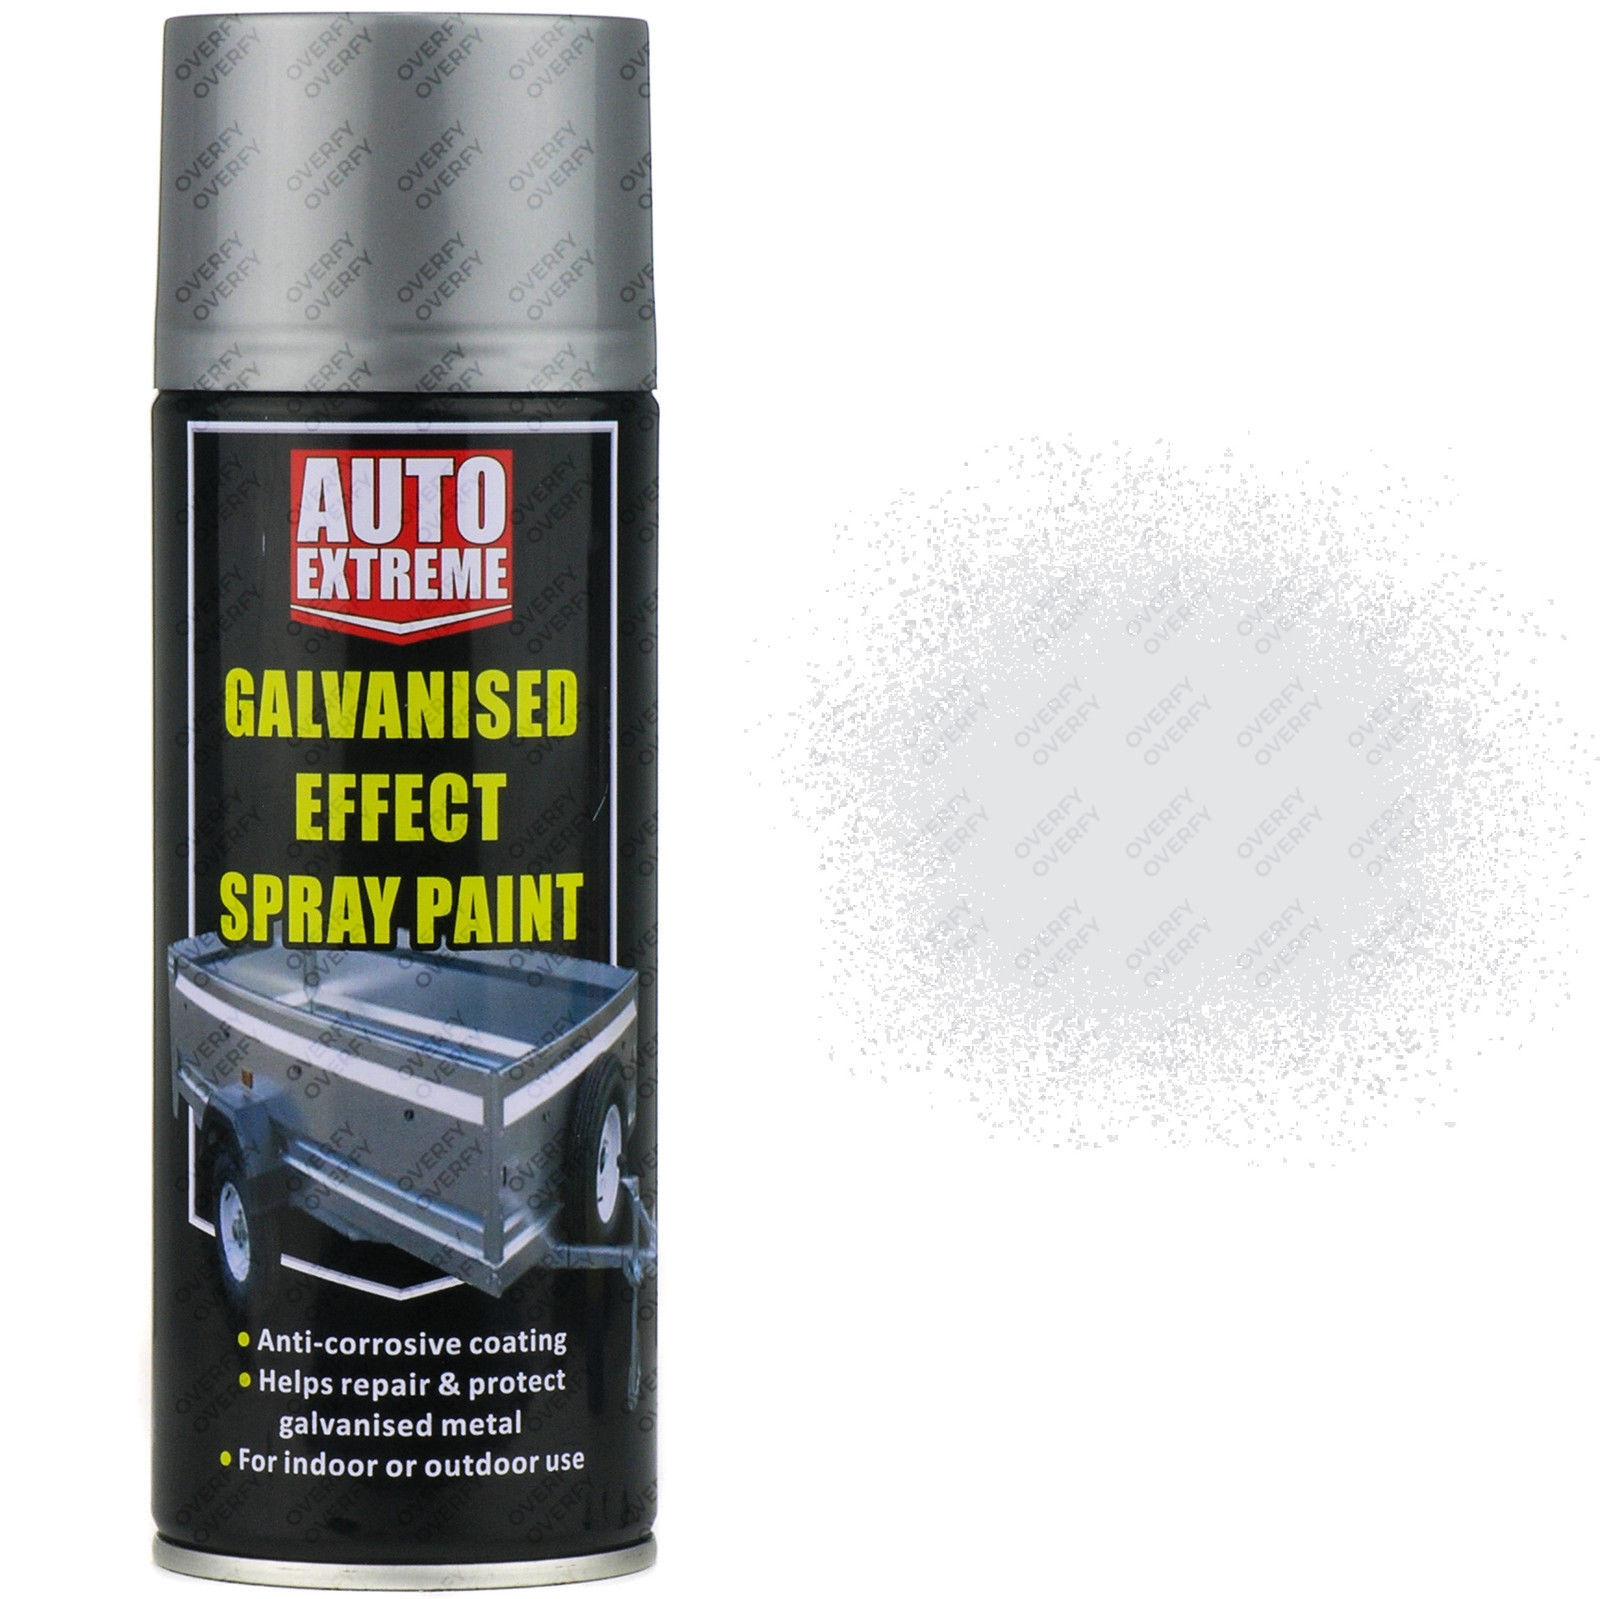 auto extreme aerosol spray paint satin gloss matt primer. Black Bedroom Furniture Sets. Home Design Ideas